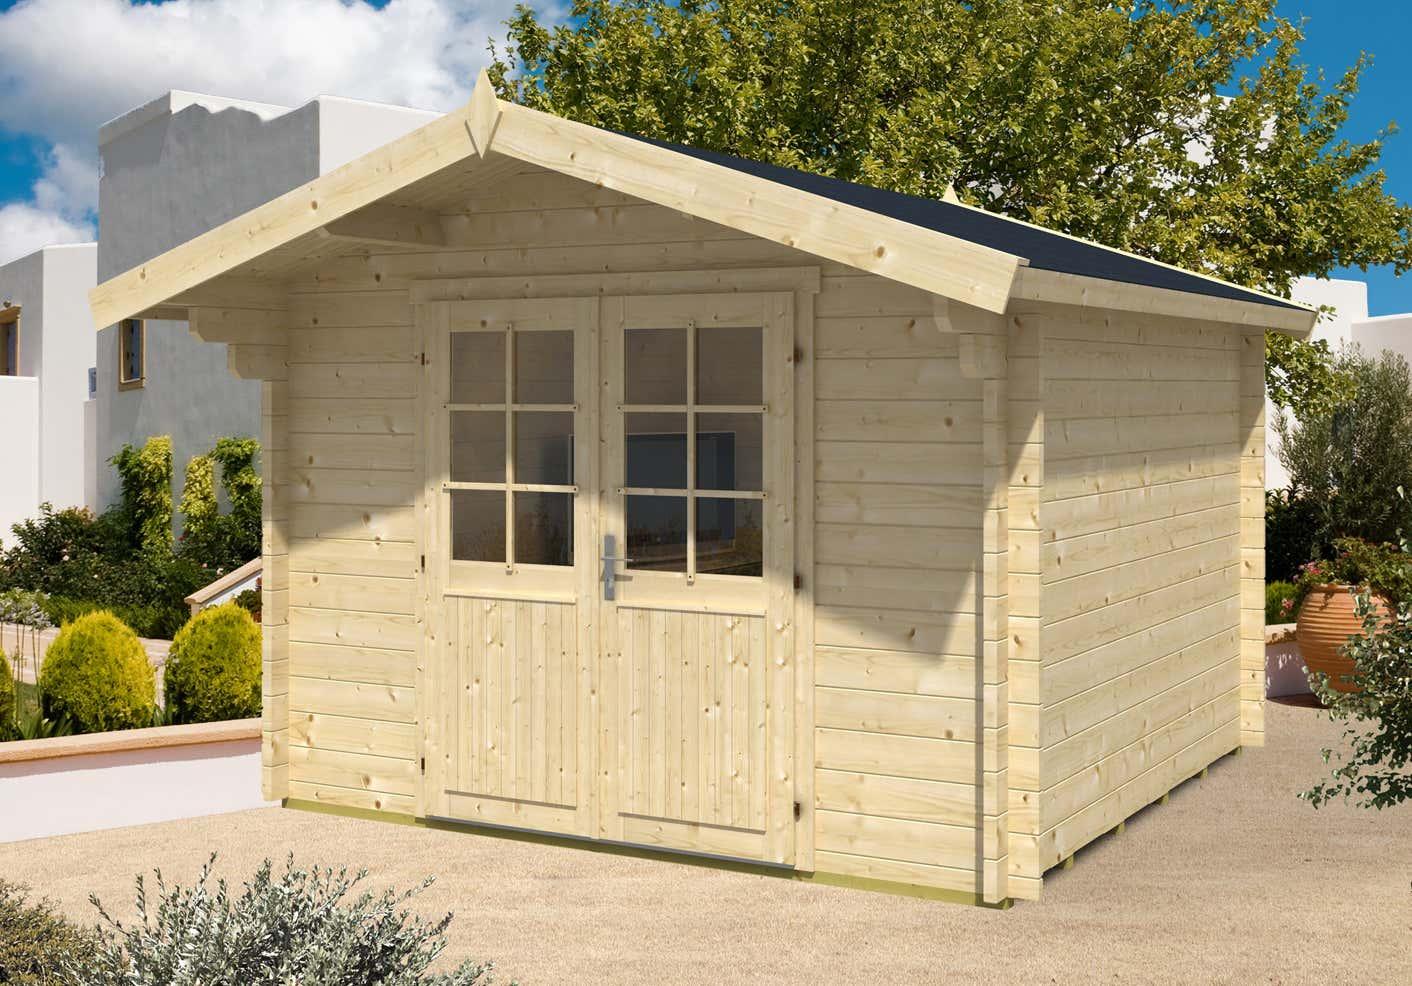 gartenhaus anna 44 iso t02344 a z gartenhaus gmbh. Black Bedroom Furniture Sets. Home Design Ideas